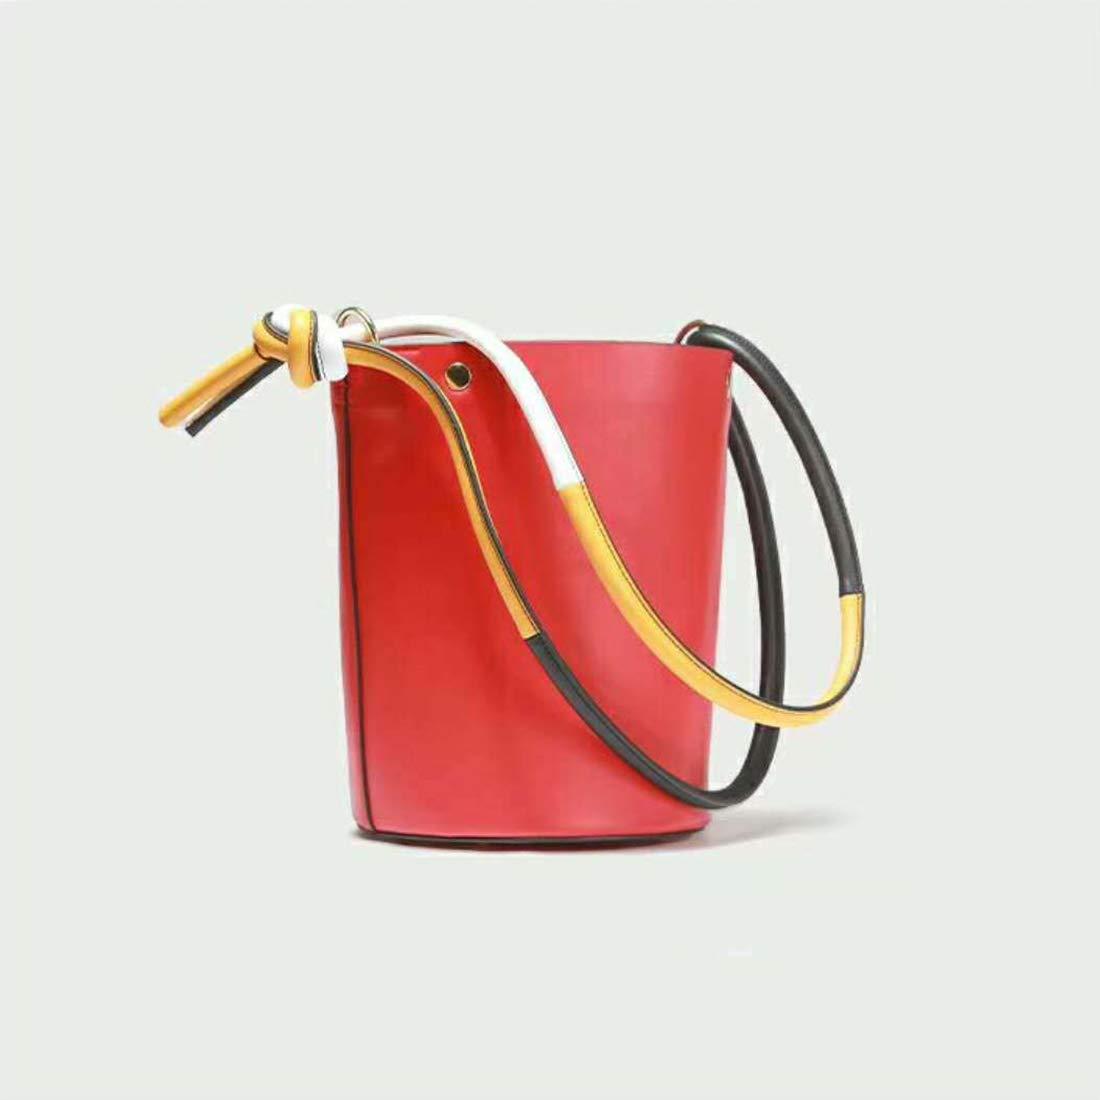 YUKILO Bucket Type Shoulder Bag Tote Bag Korea Fashion Large Capacity Ladies Cowhide Color : Red